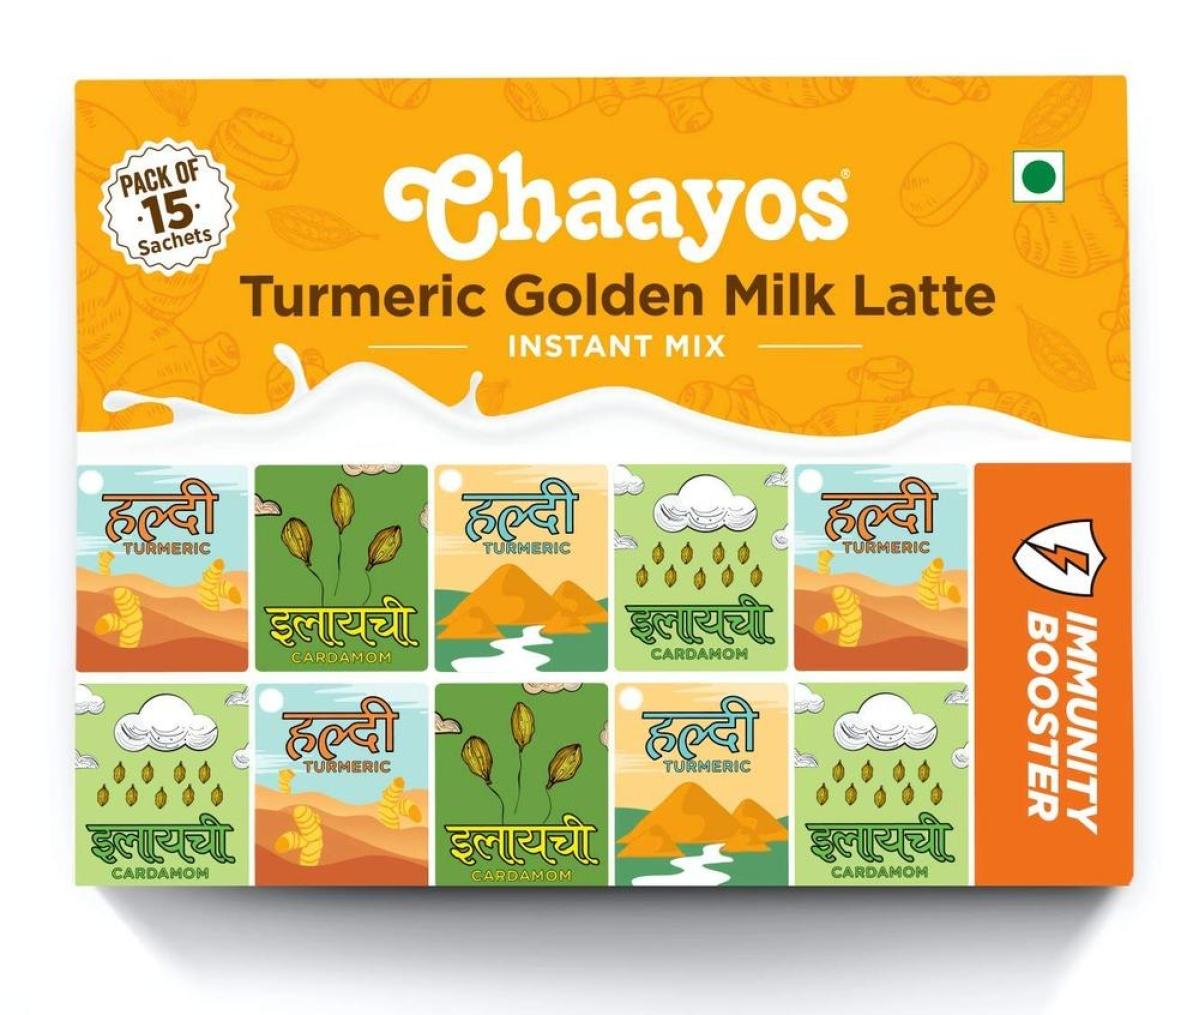 After Chaayos, Tata, and Dabur, Society Tea introduces Haldi Doodh mix